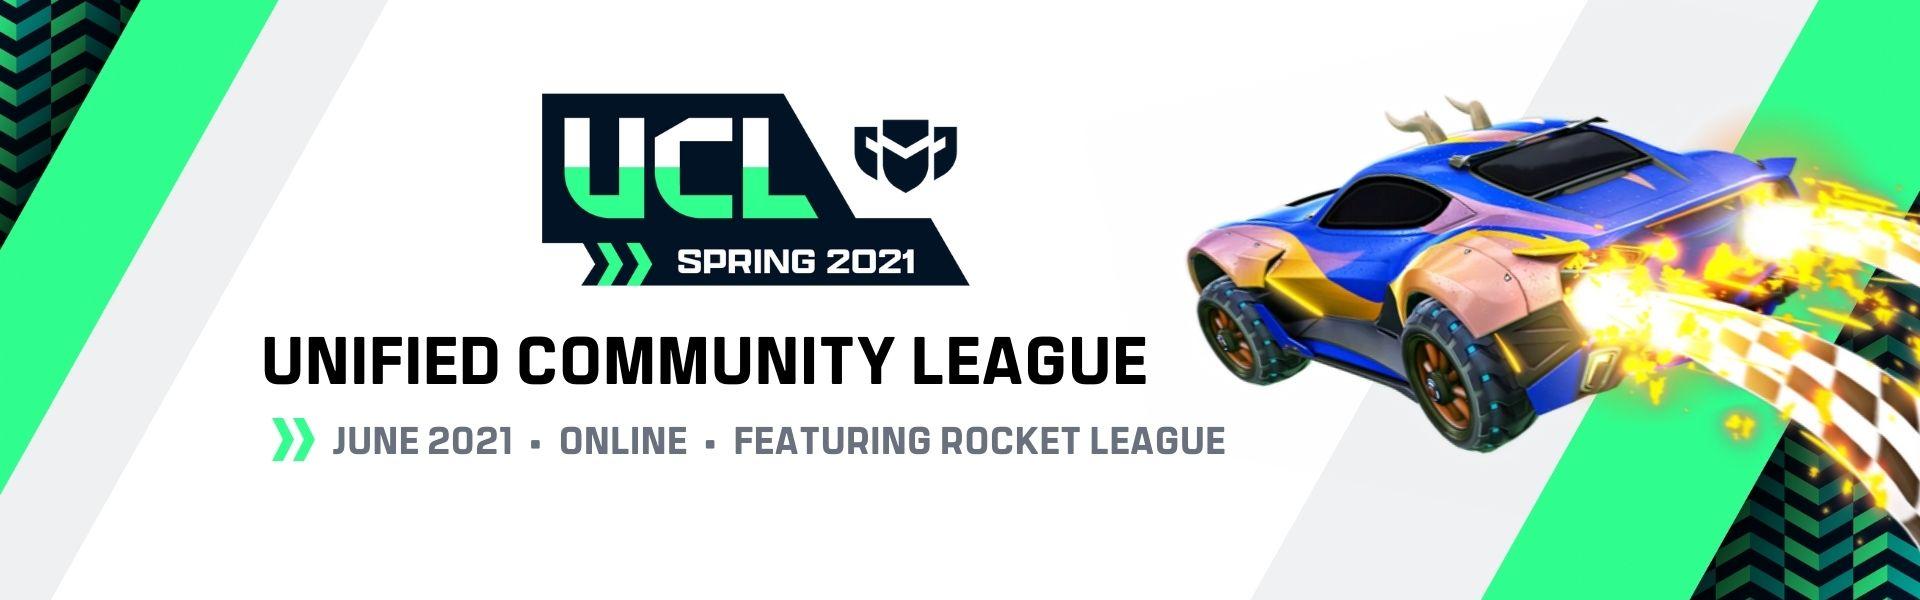 June CEL: Featuring Rocket League